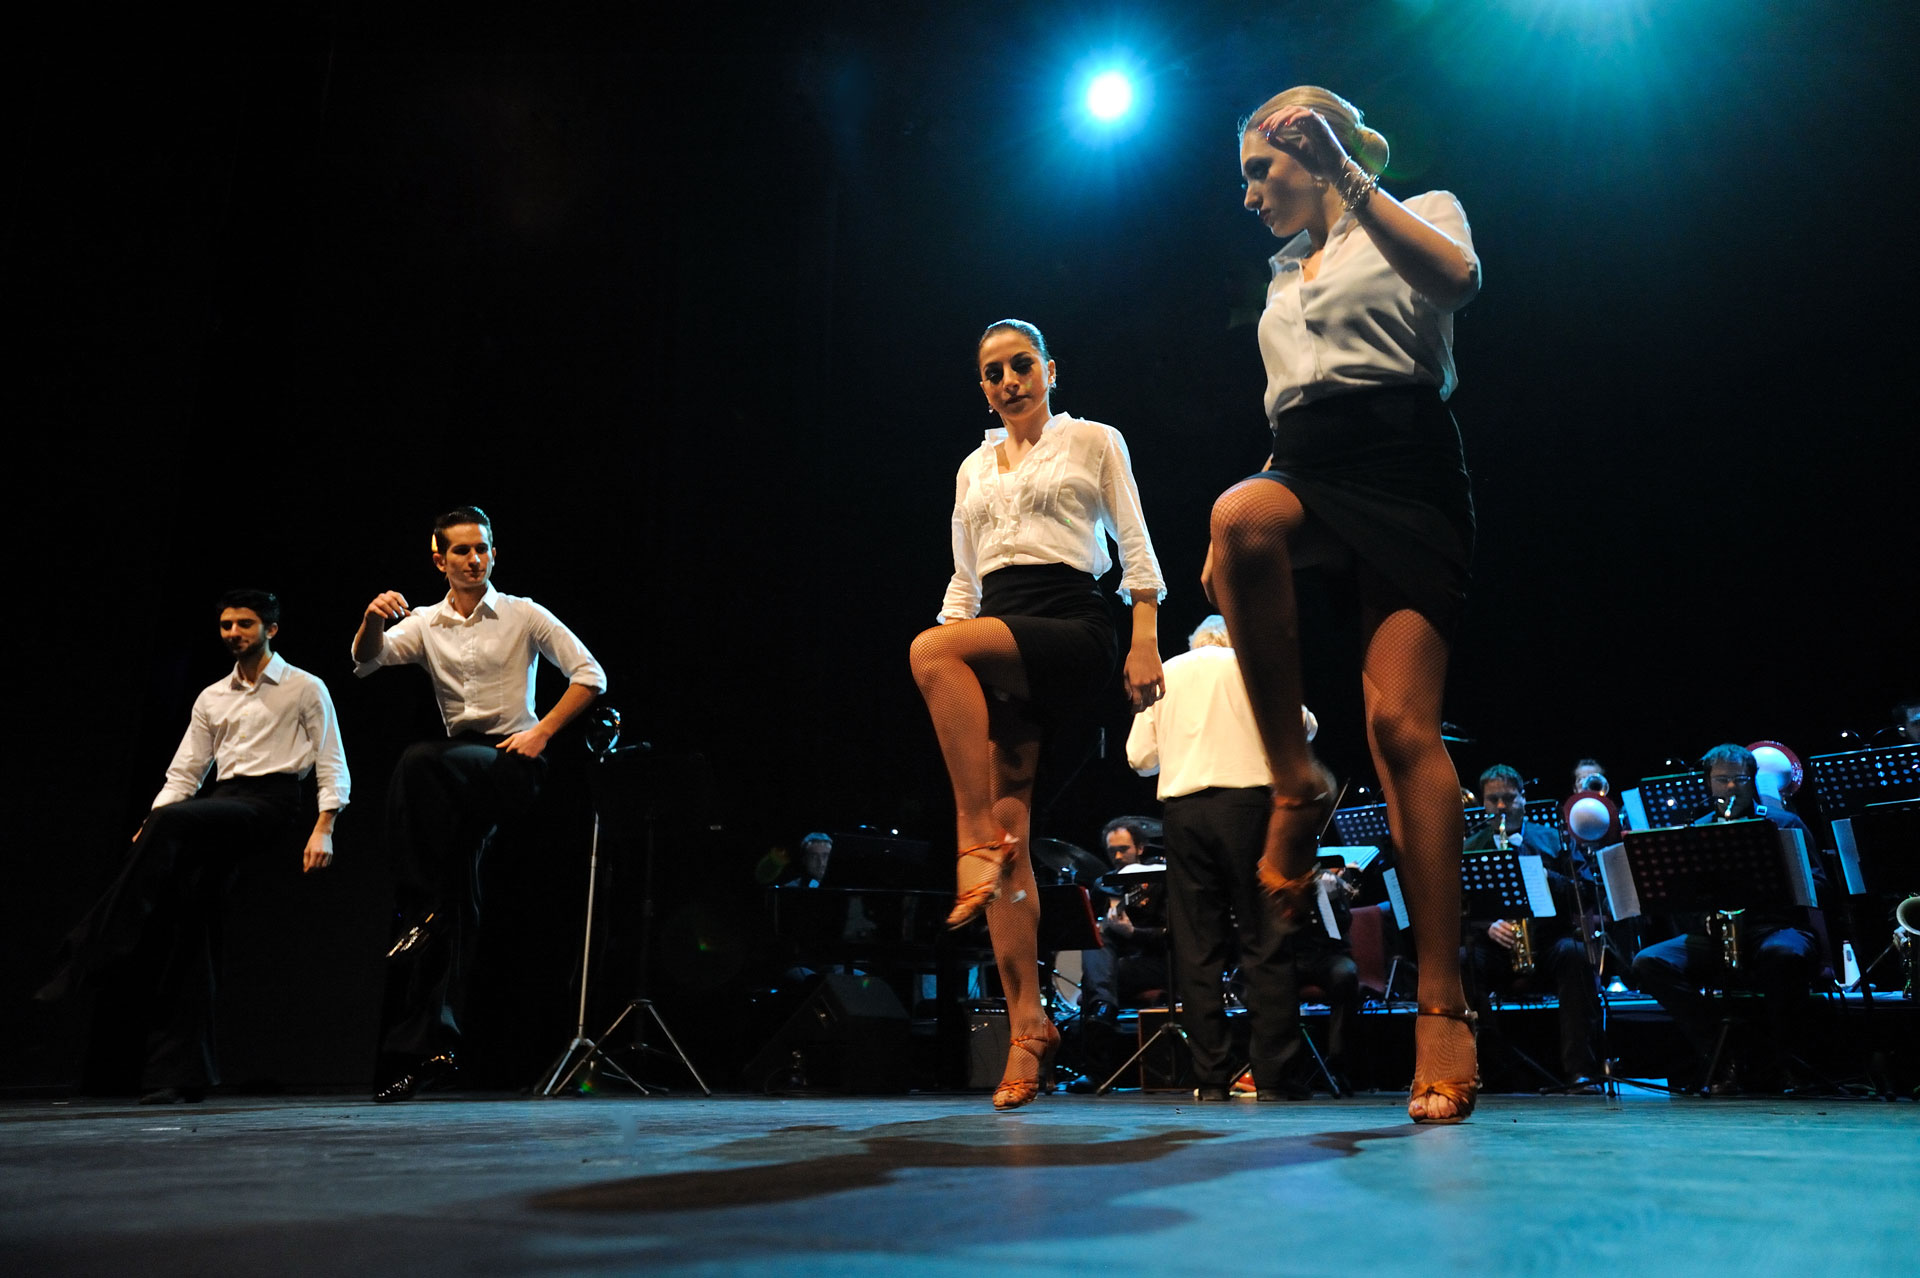 Martina-Gamboz-Interakta-Kultura_Happy-feet-Foto-Igor-Opassi_ballerine